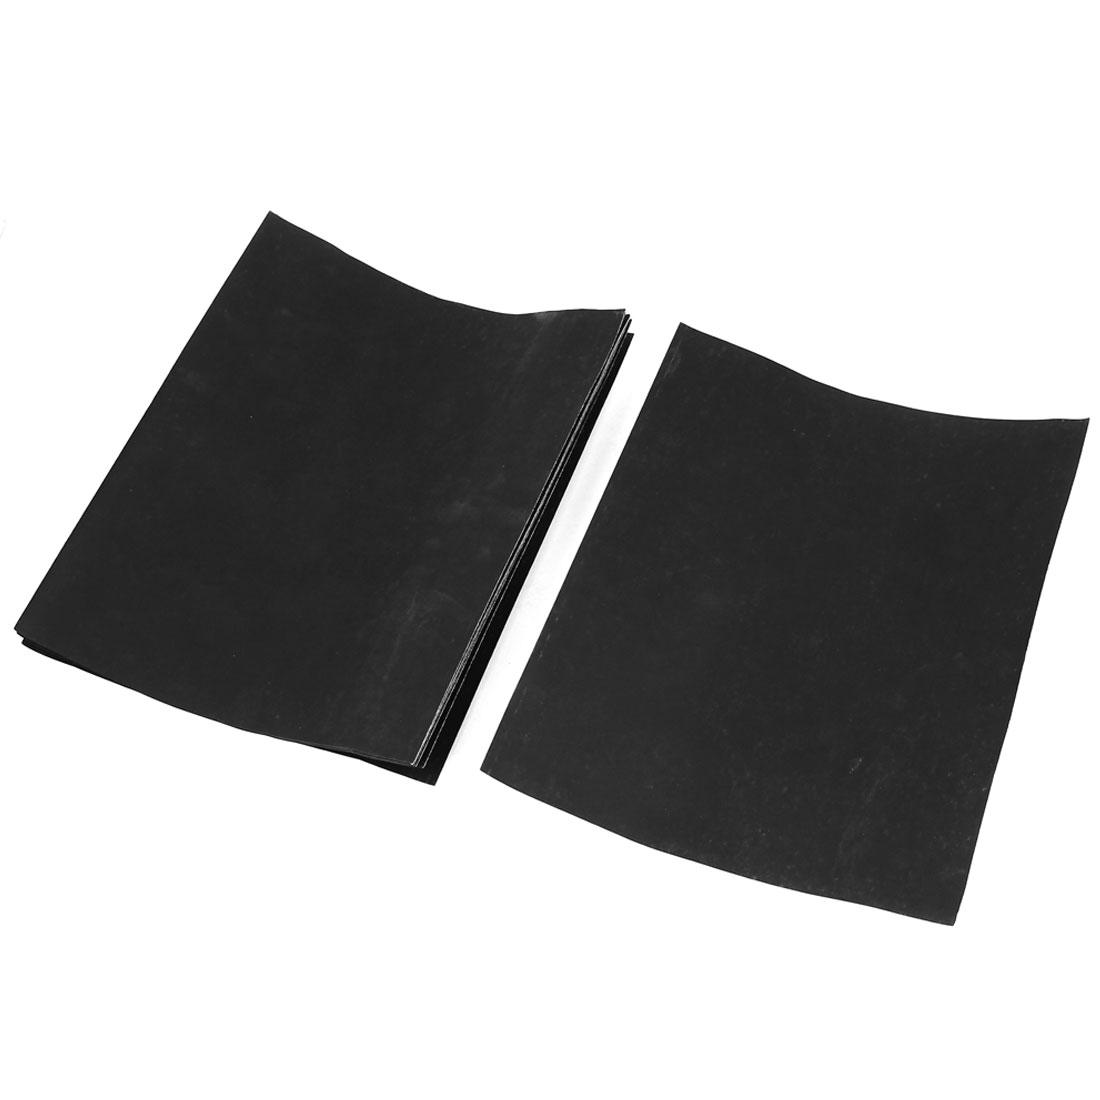 Wet Dry Abrasive Sandpaper Sheets Sand Paper Gray 1200 Grit 10pcs